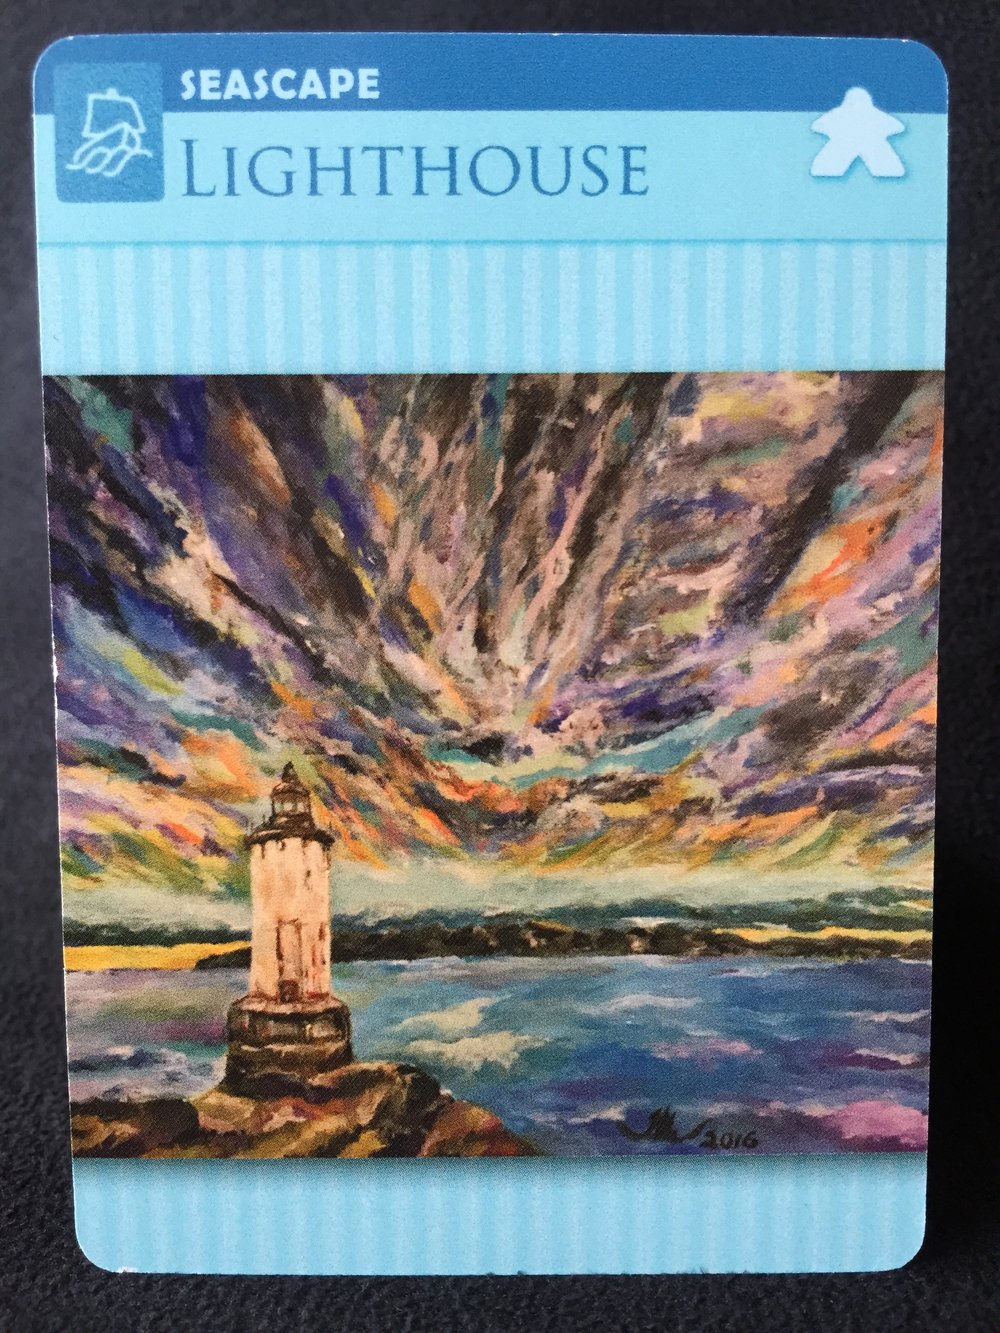 seascape lighthouse.jpeg